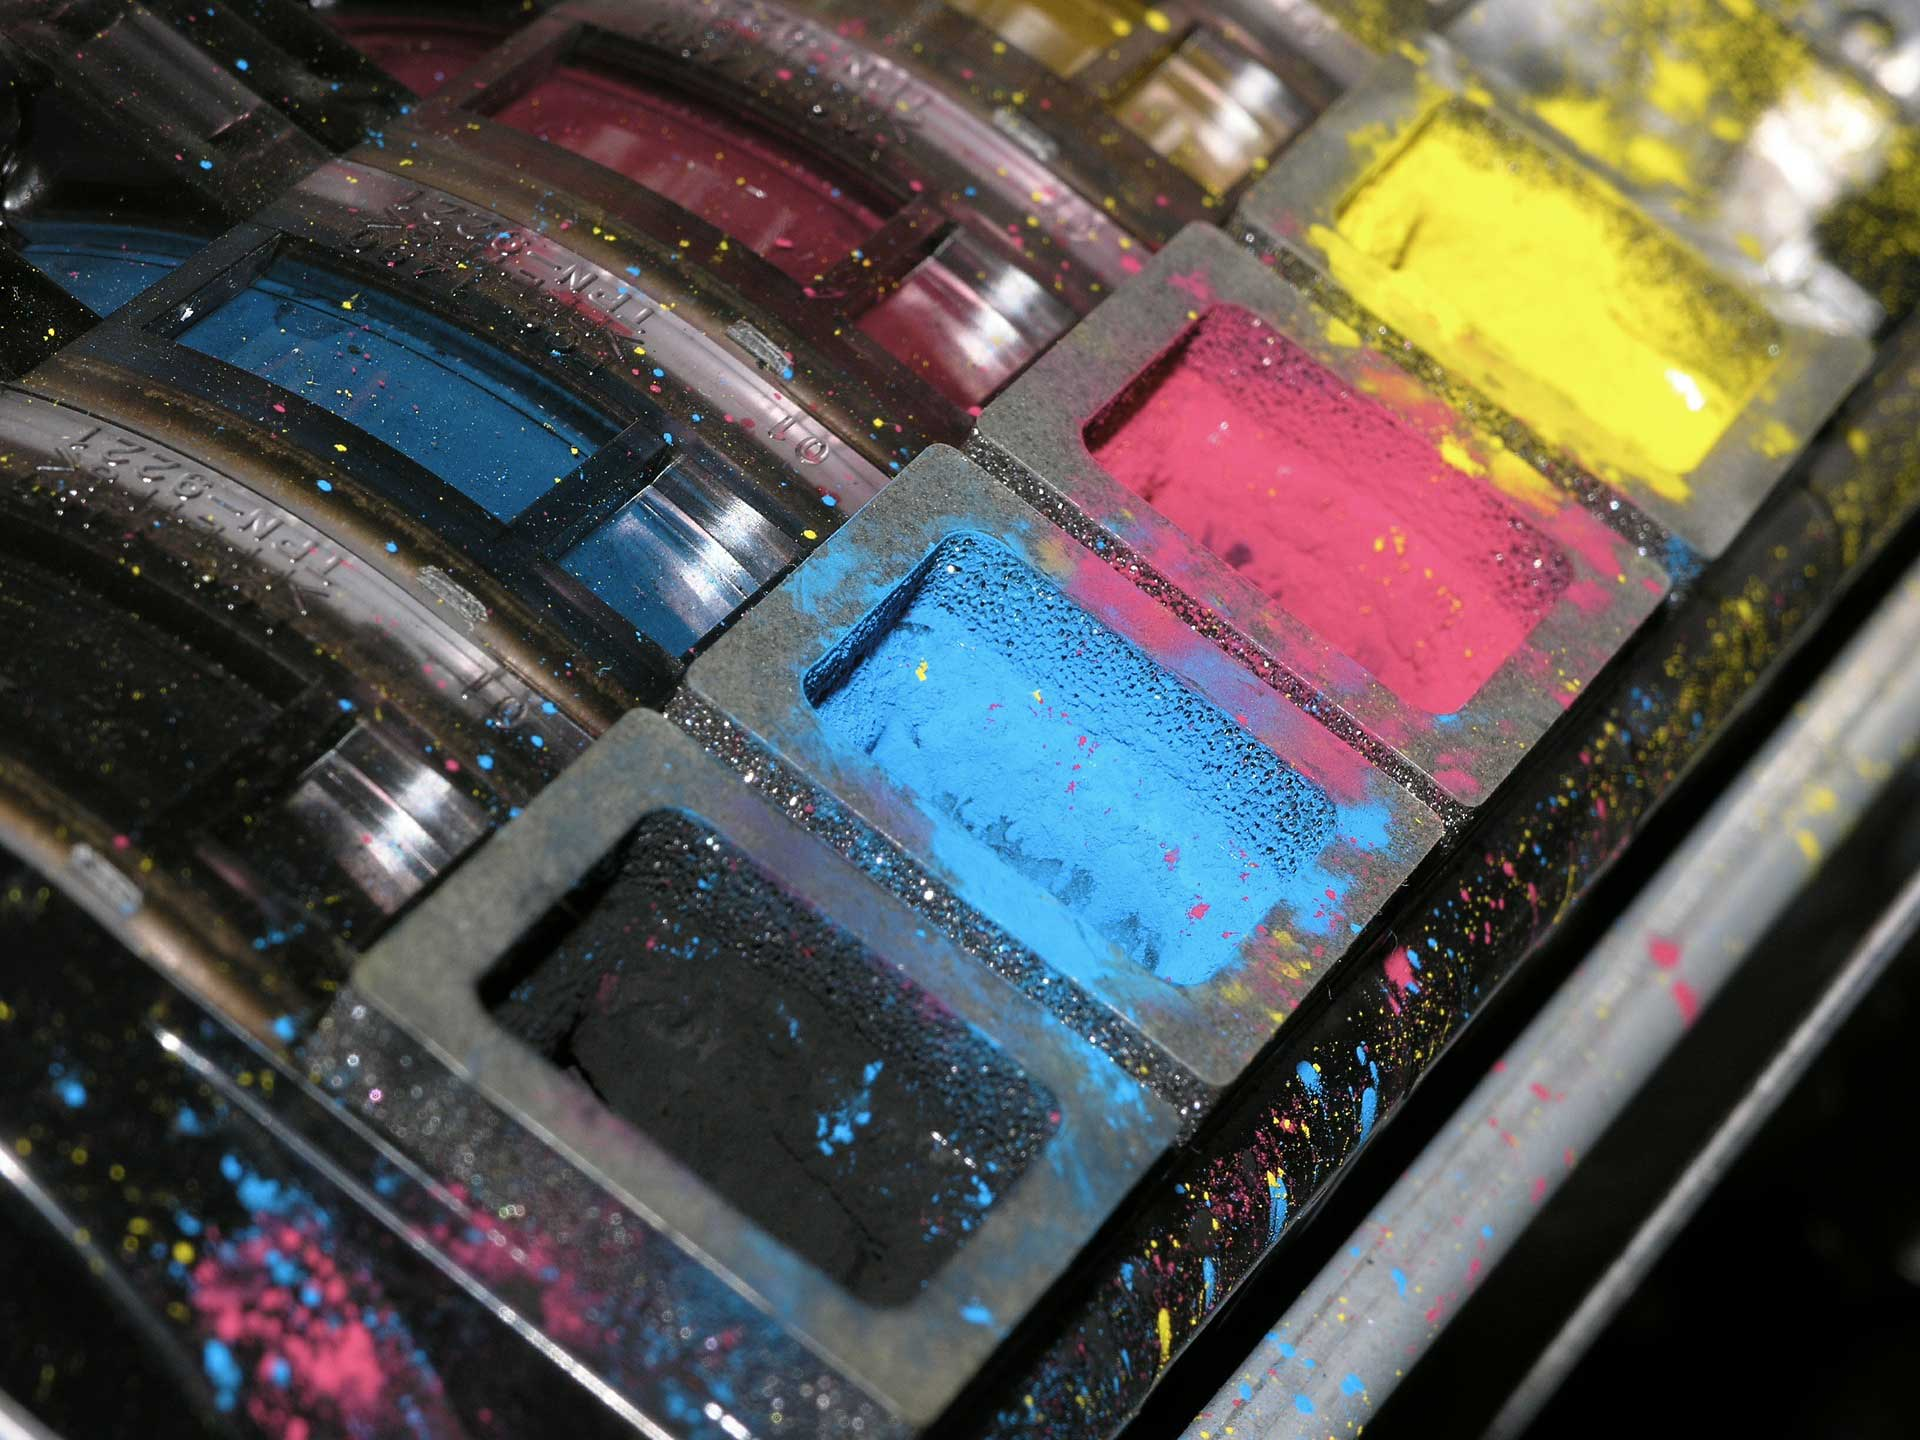 Maintenance photocopieur 44